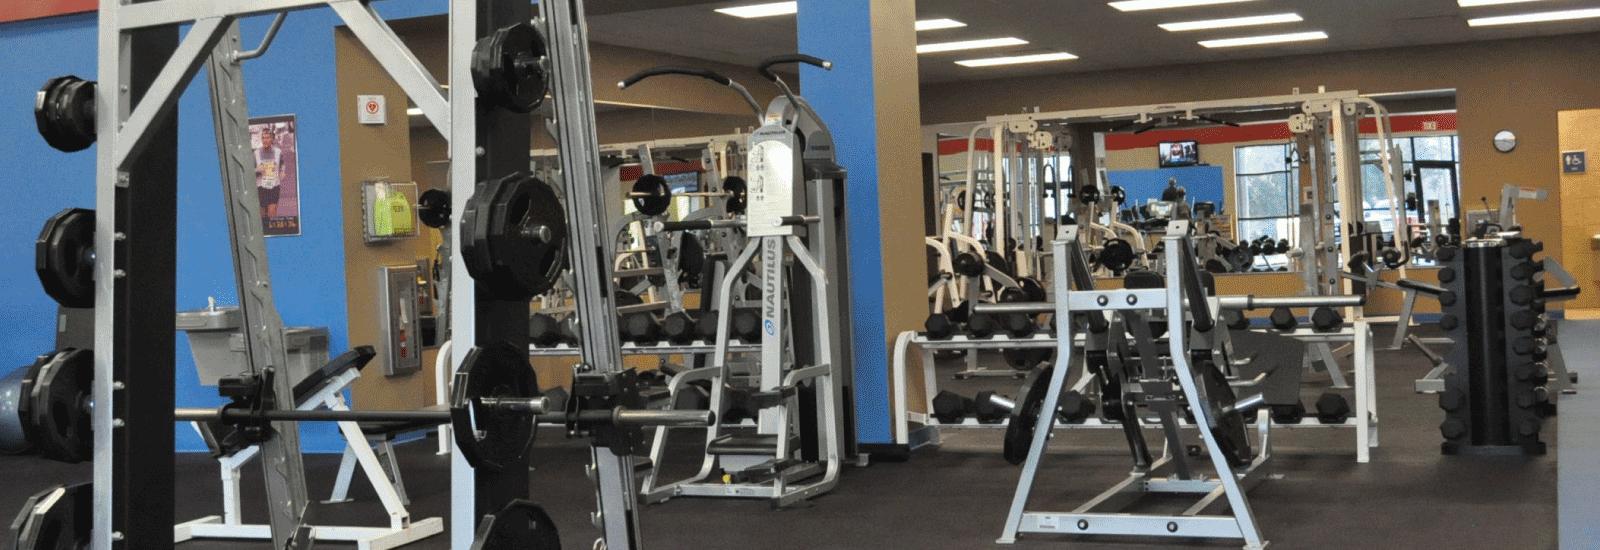 Redstone Arsenal Gym